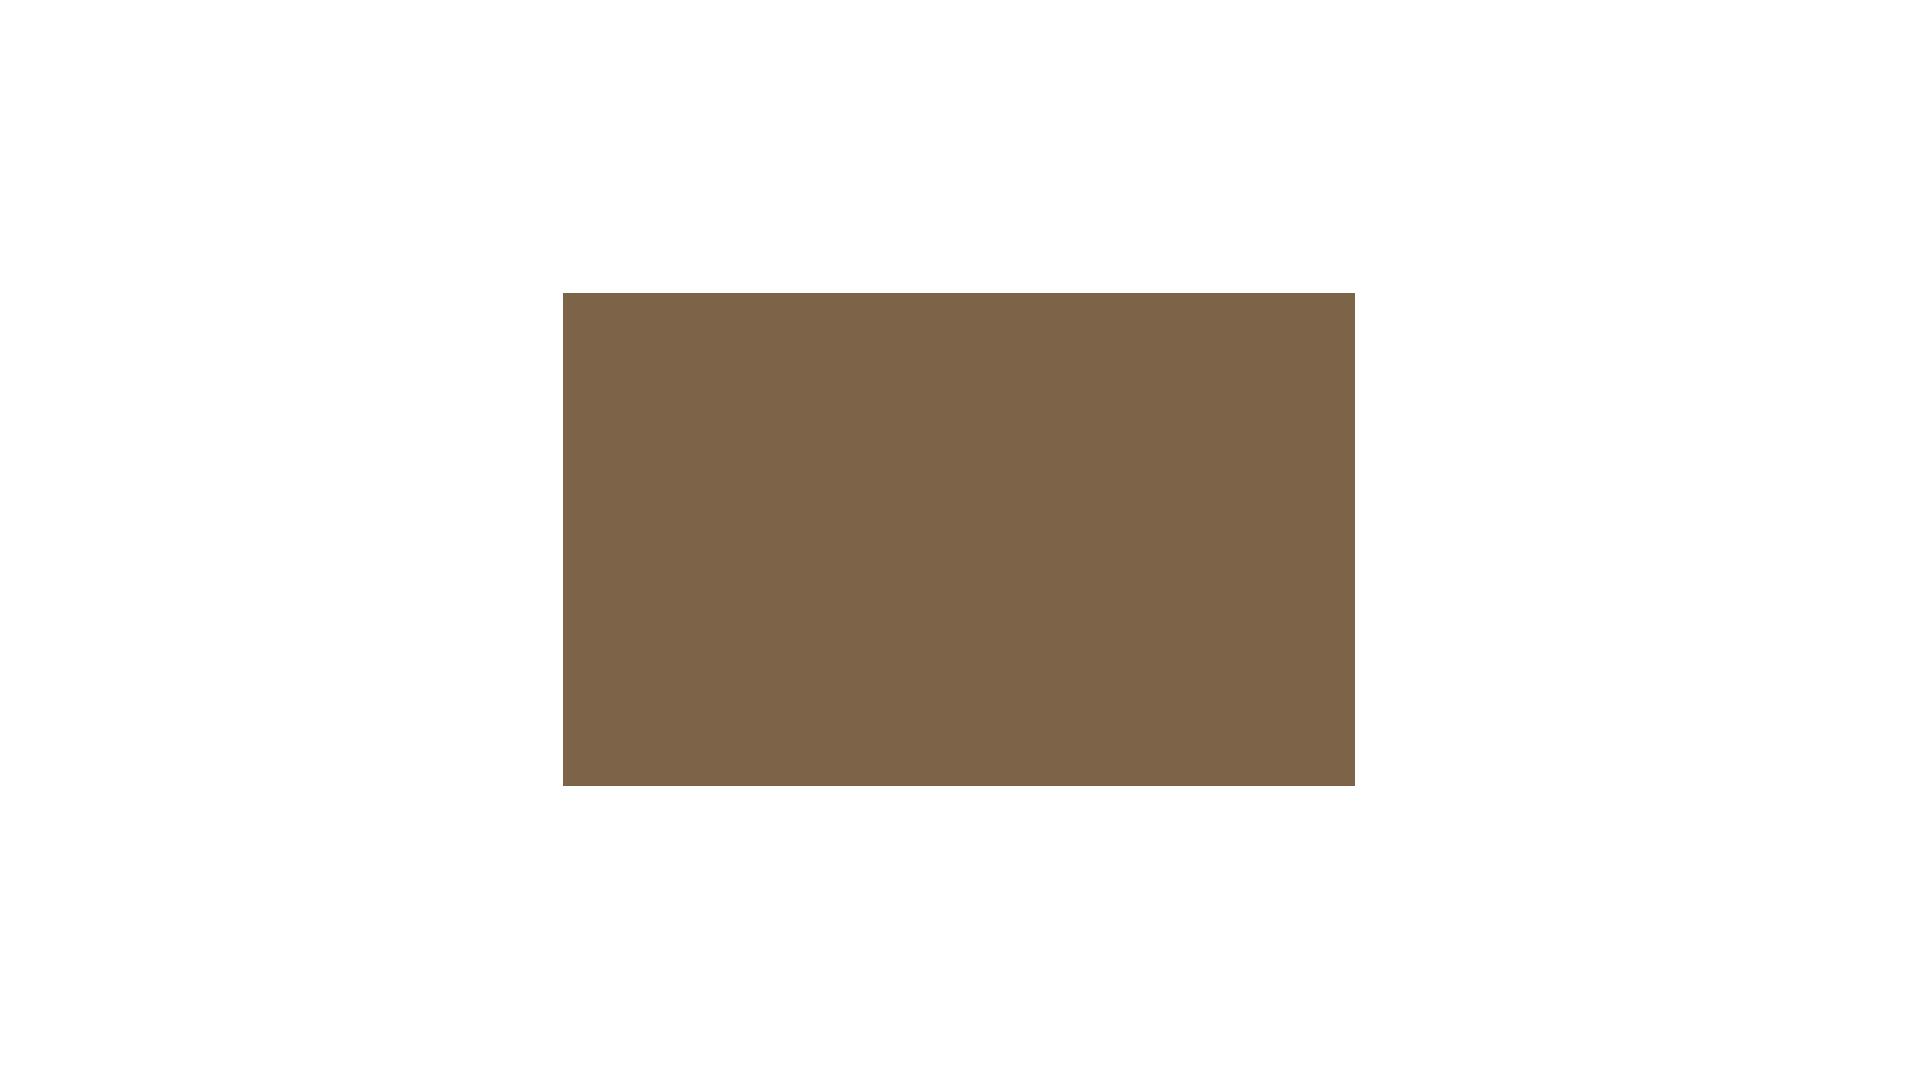 access-optic-utilisation-001